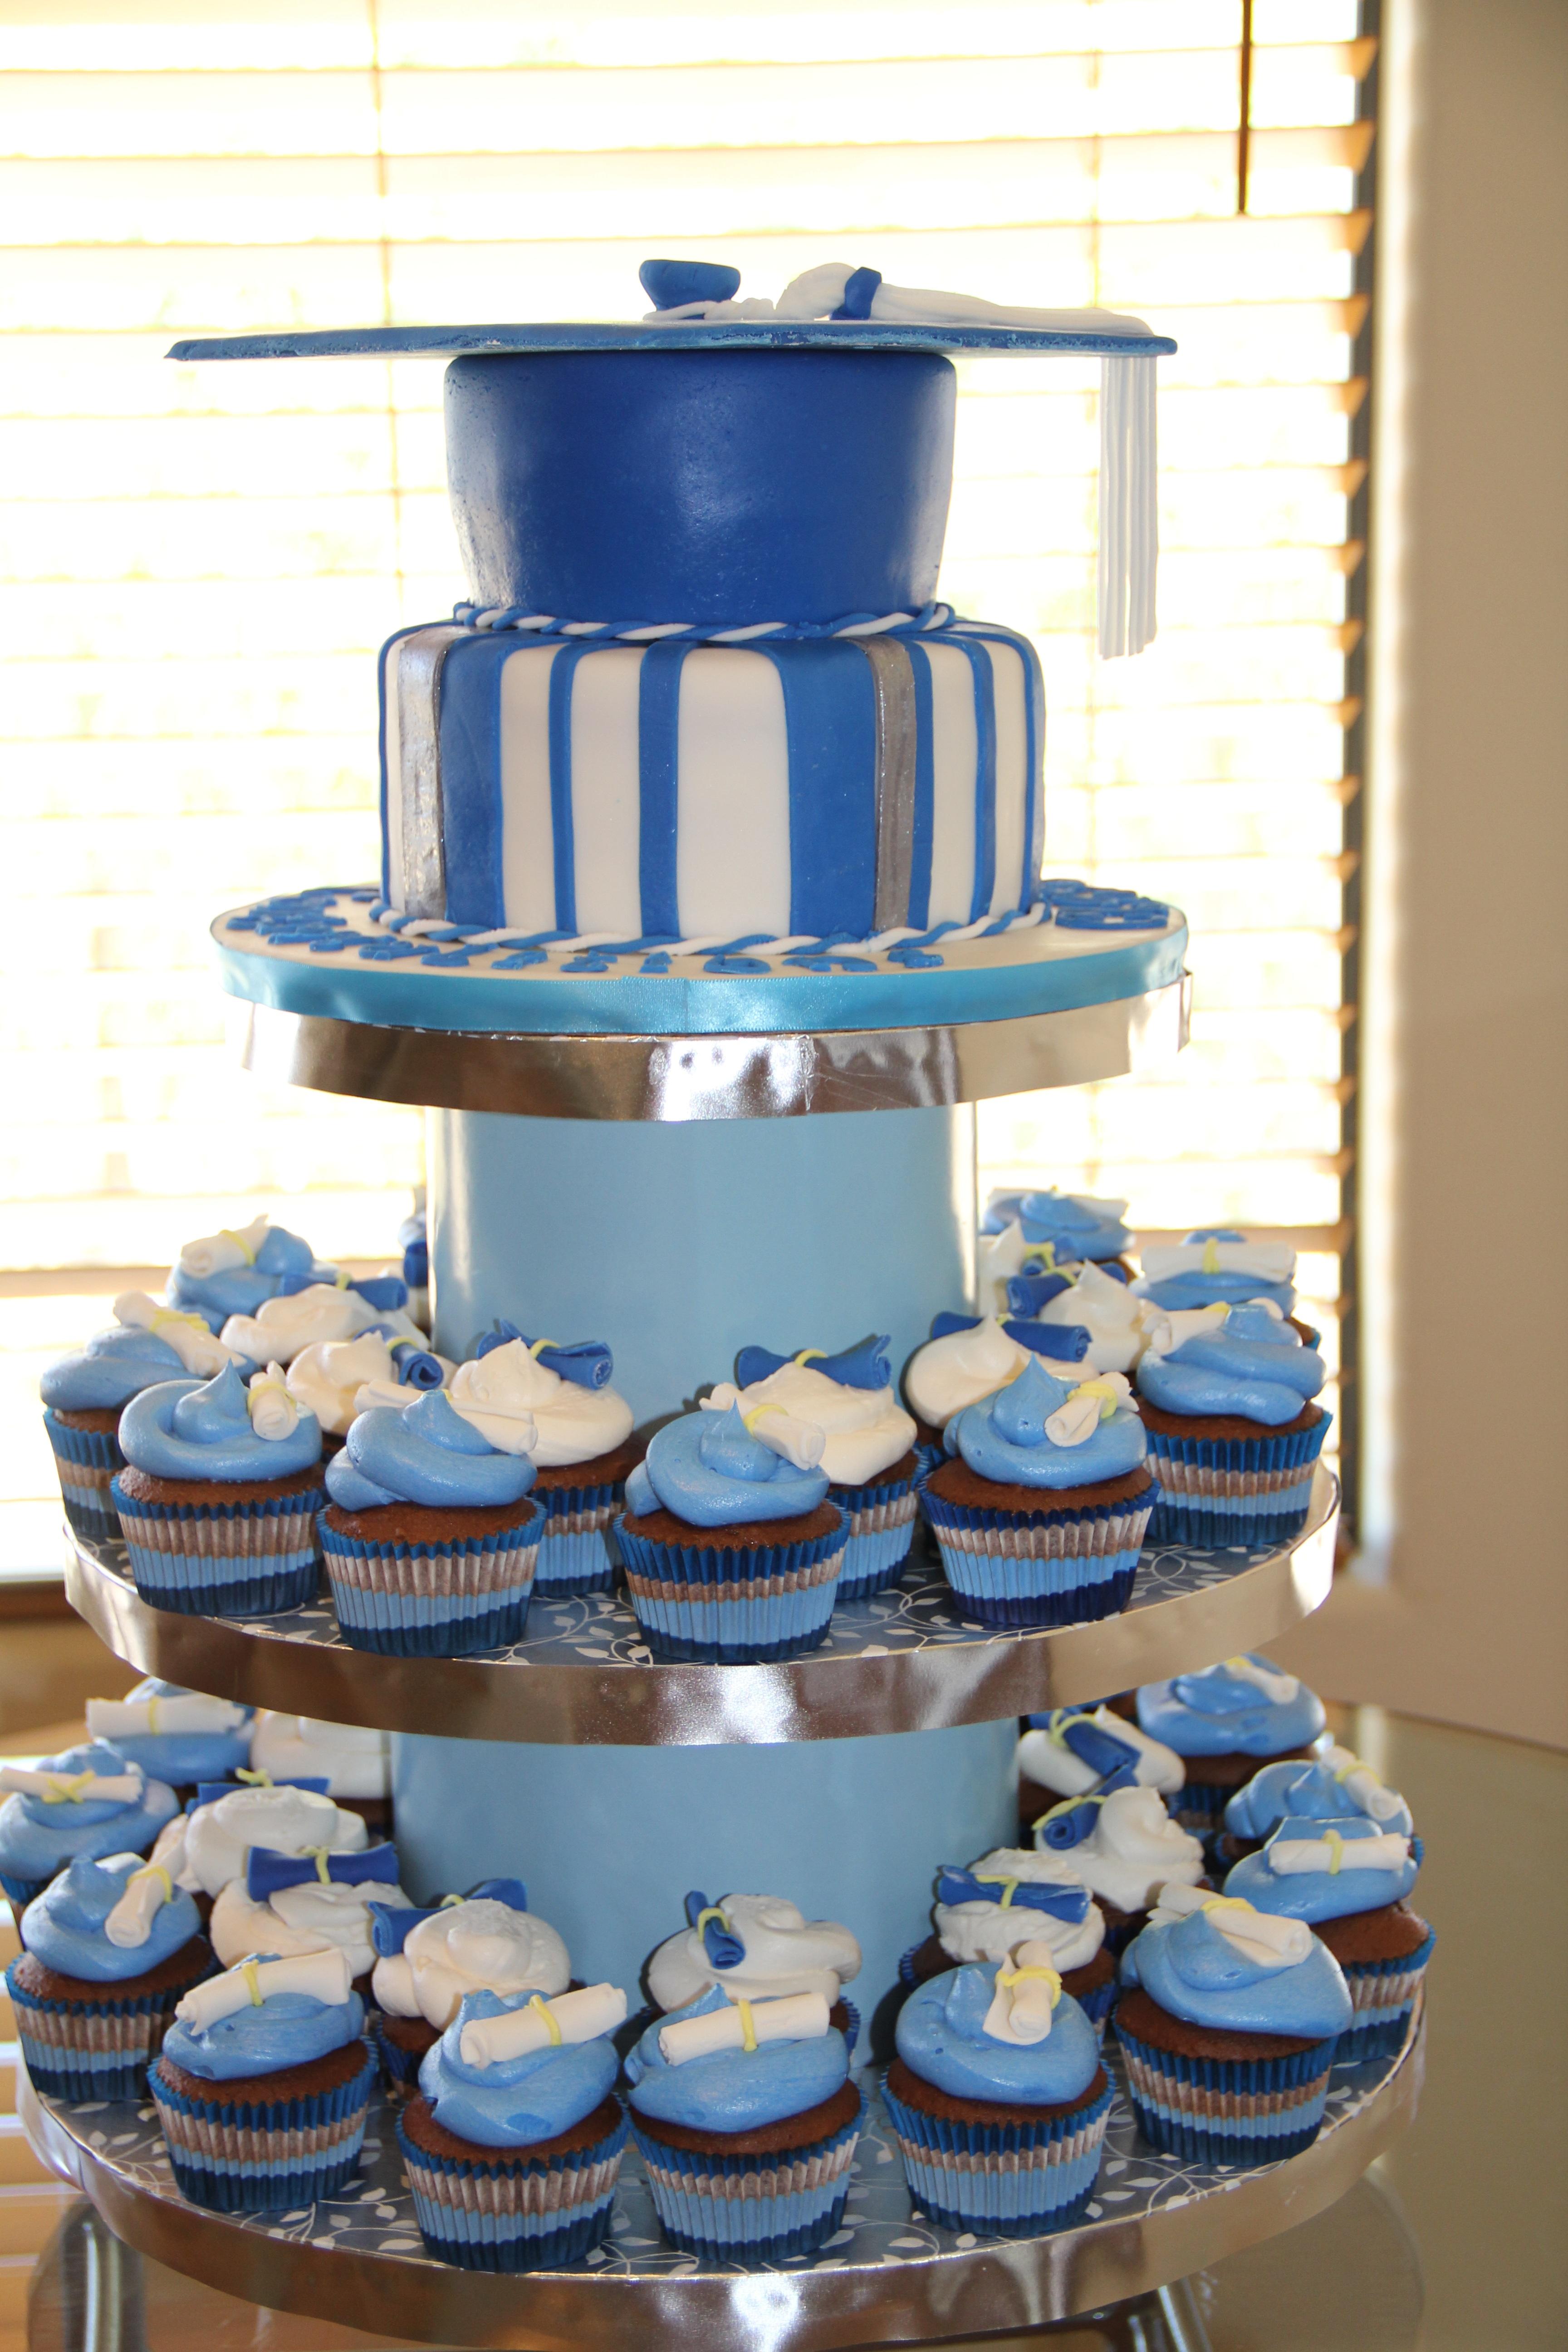 Free Images sweet celebration food blue chocolate cupcake